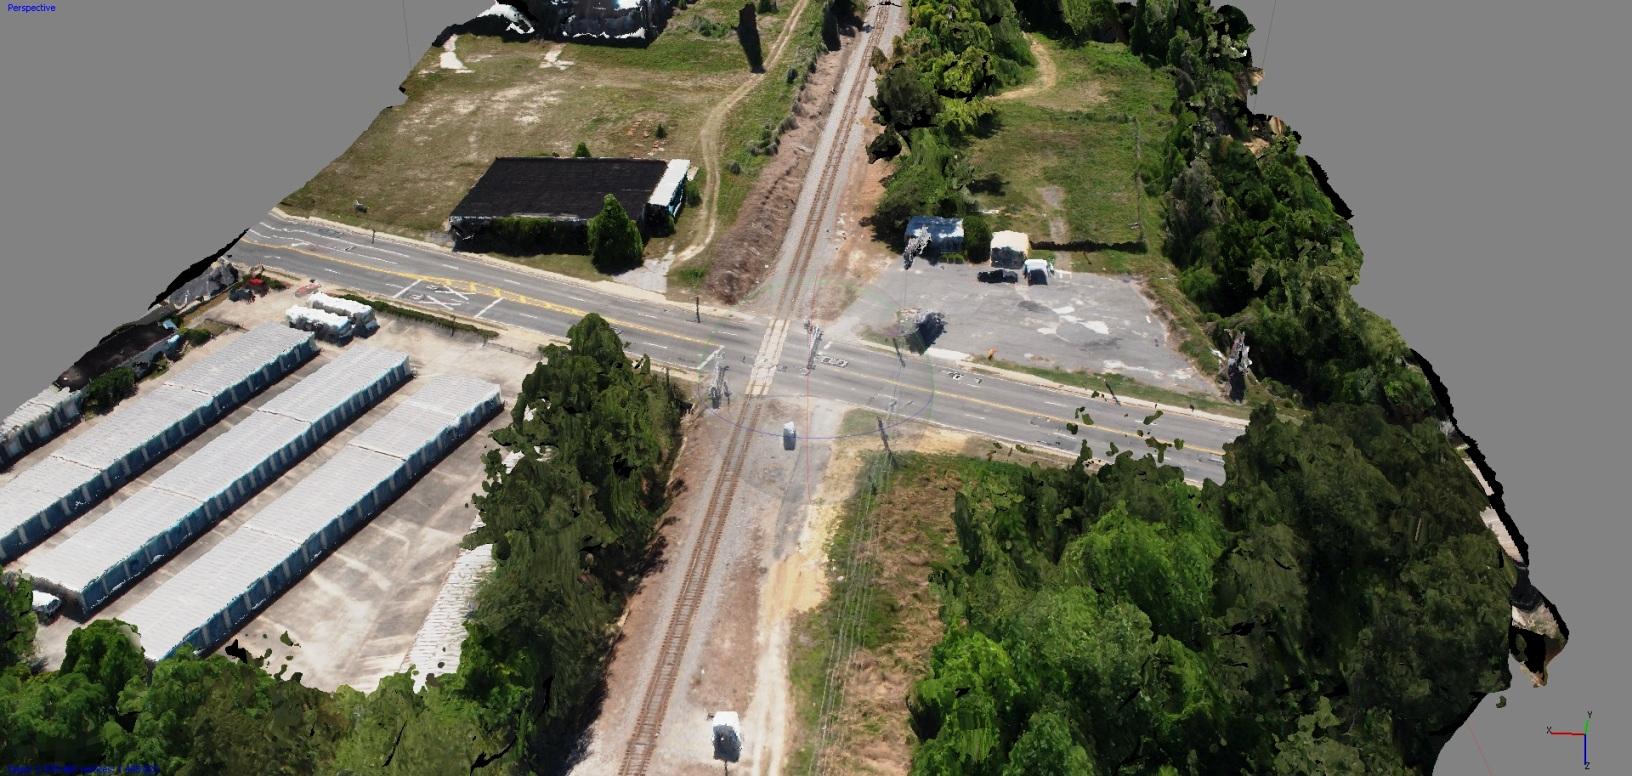 3D model of railroad crossing